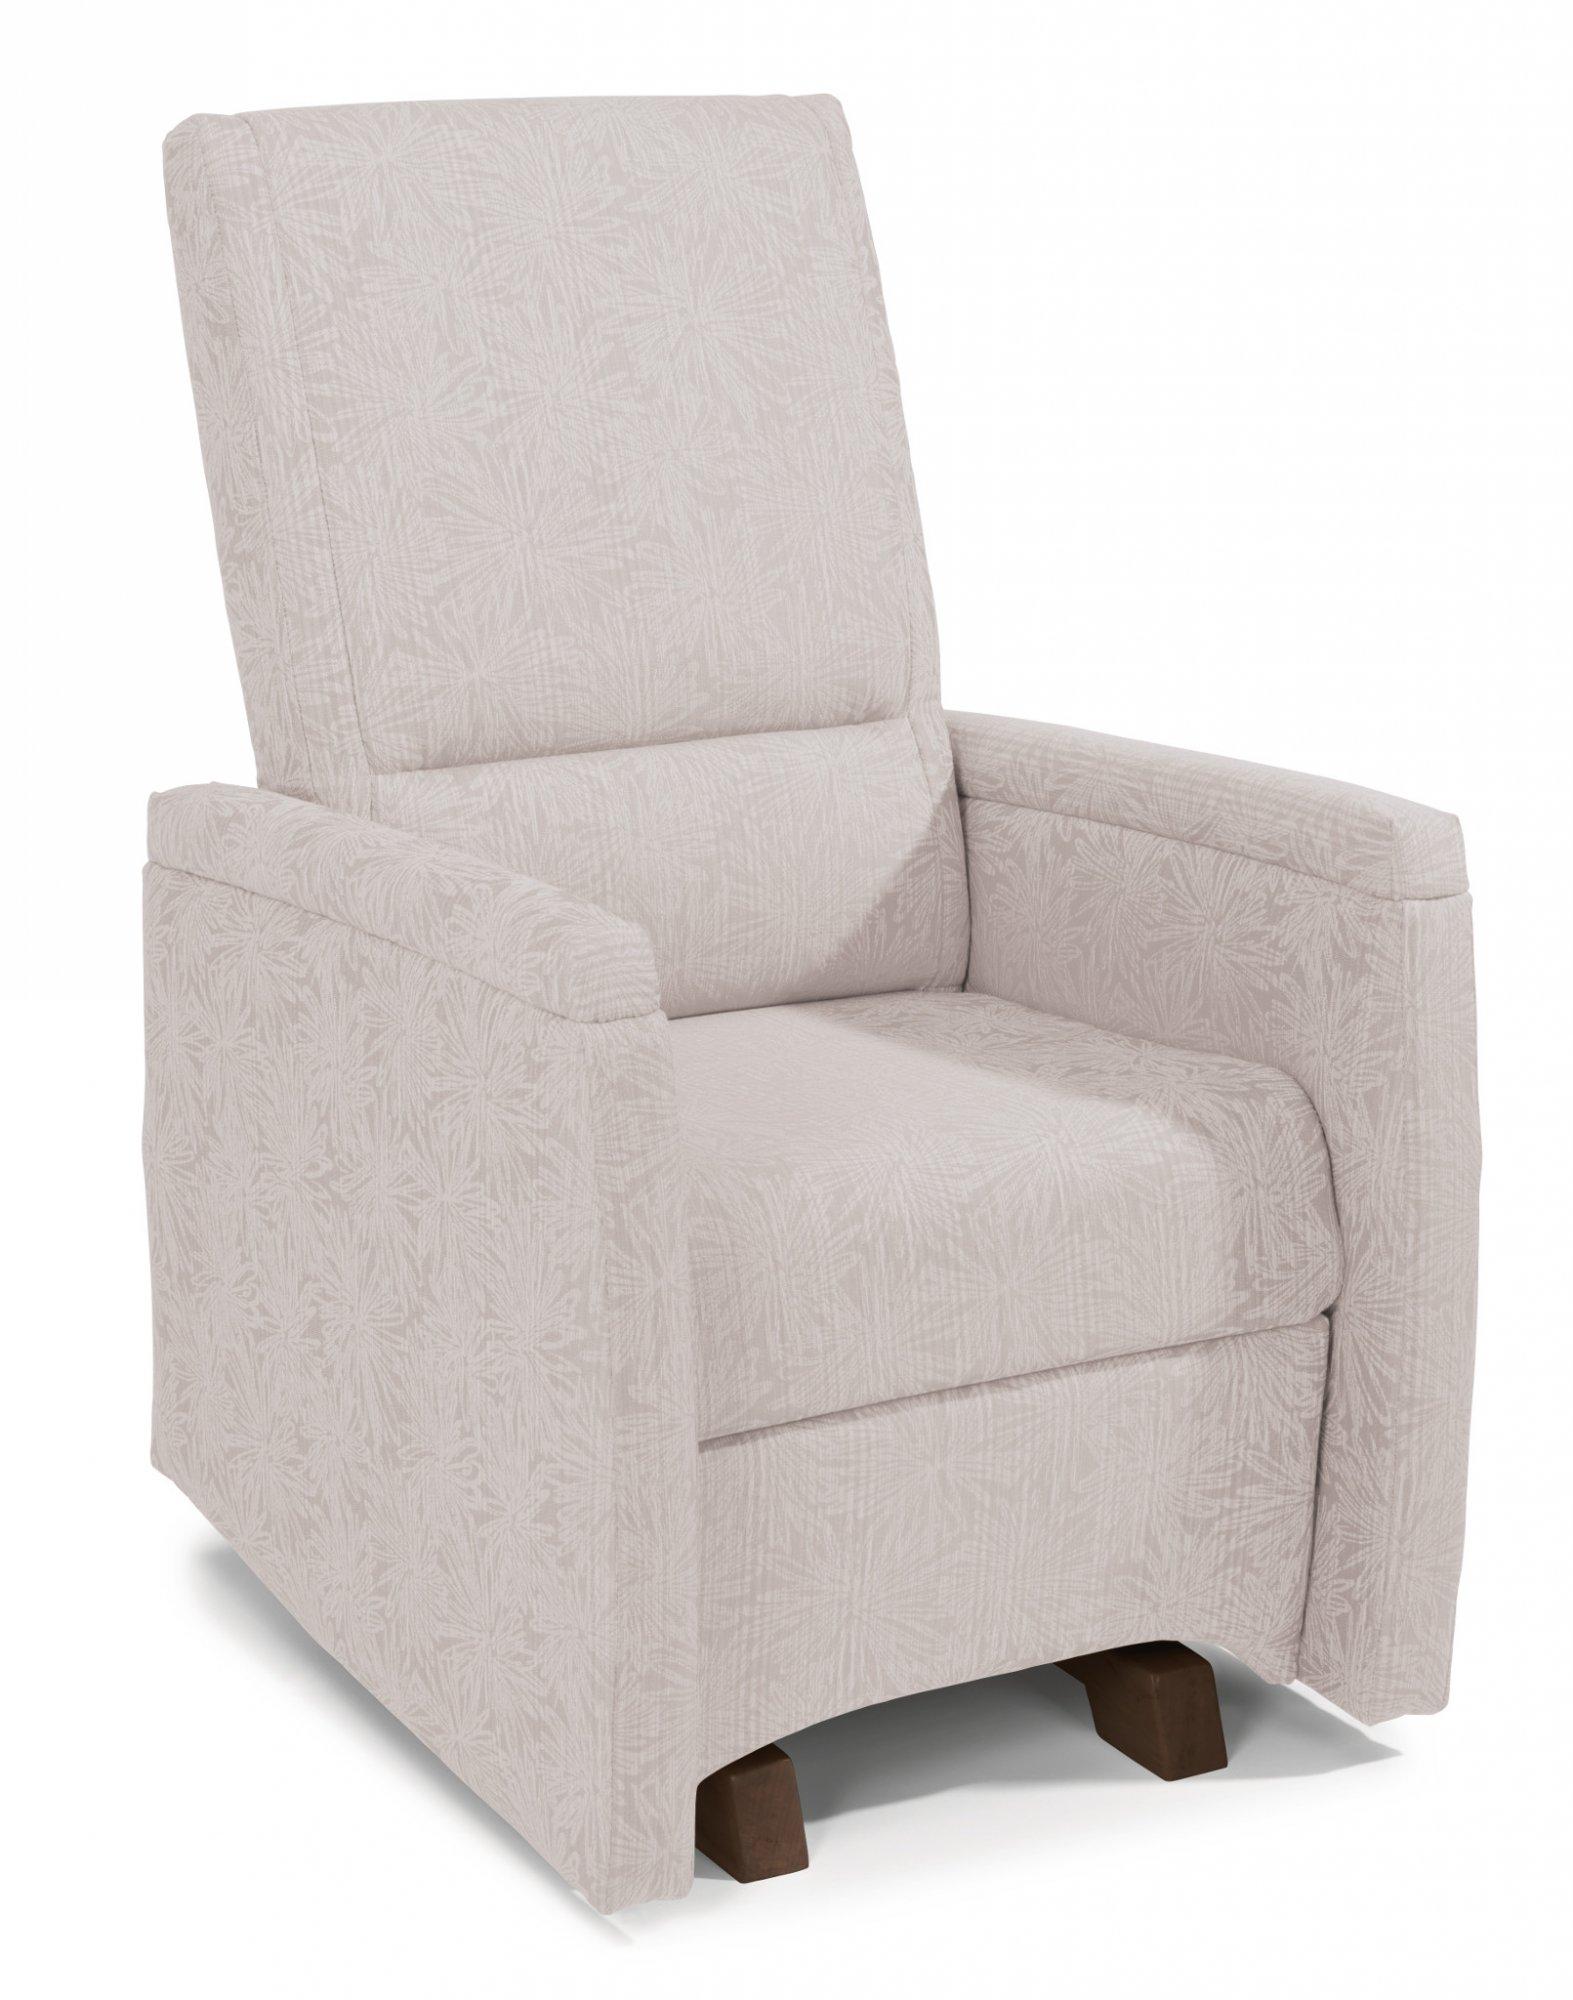 Super Solon Flexsteel Com Andrewgaddart Wooden Chair Designs For Living Room Andrewgaddartcom